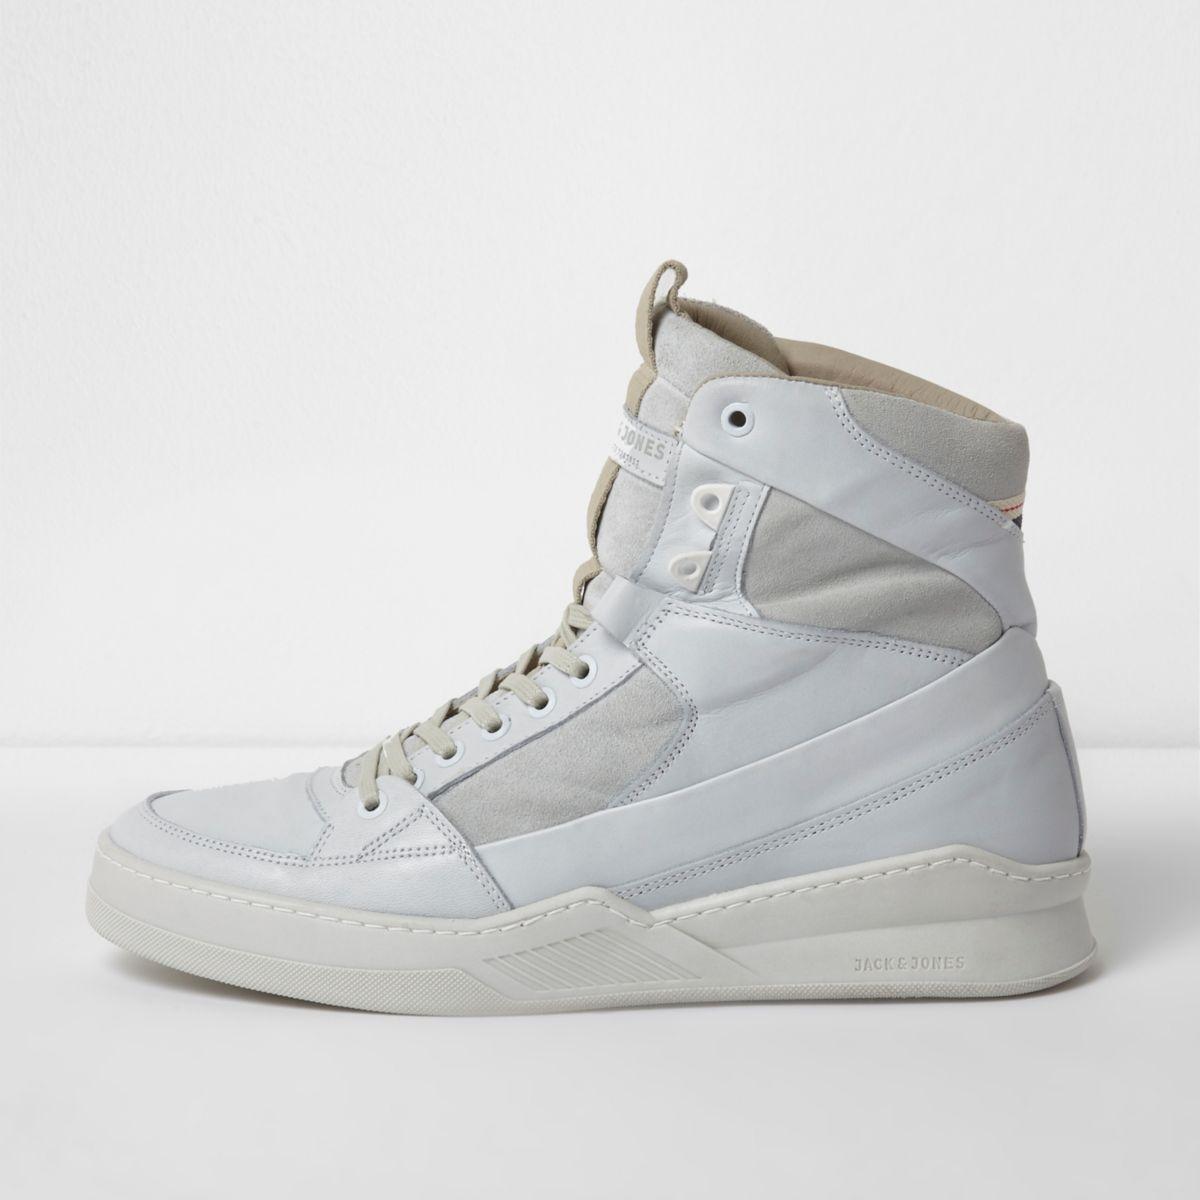 Jack & Jones white leather hi top trainers